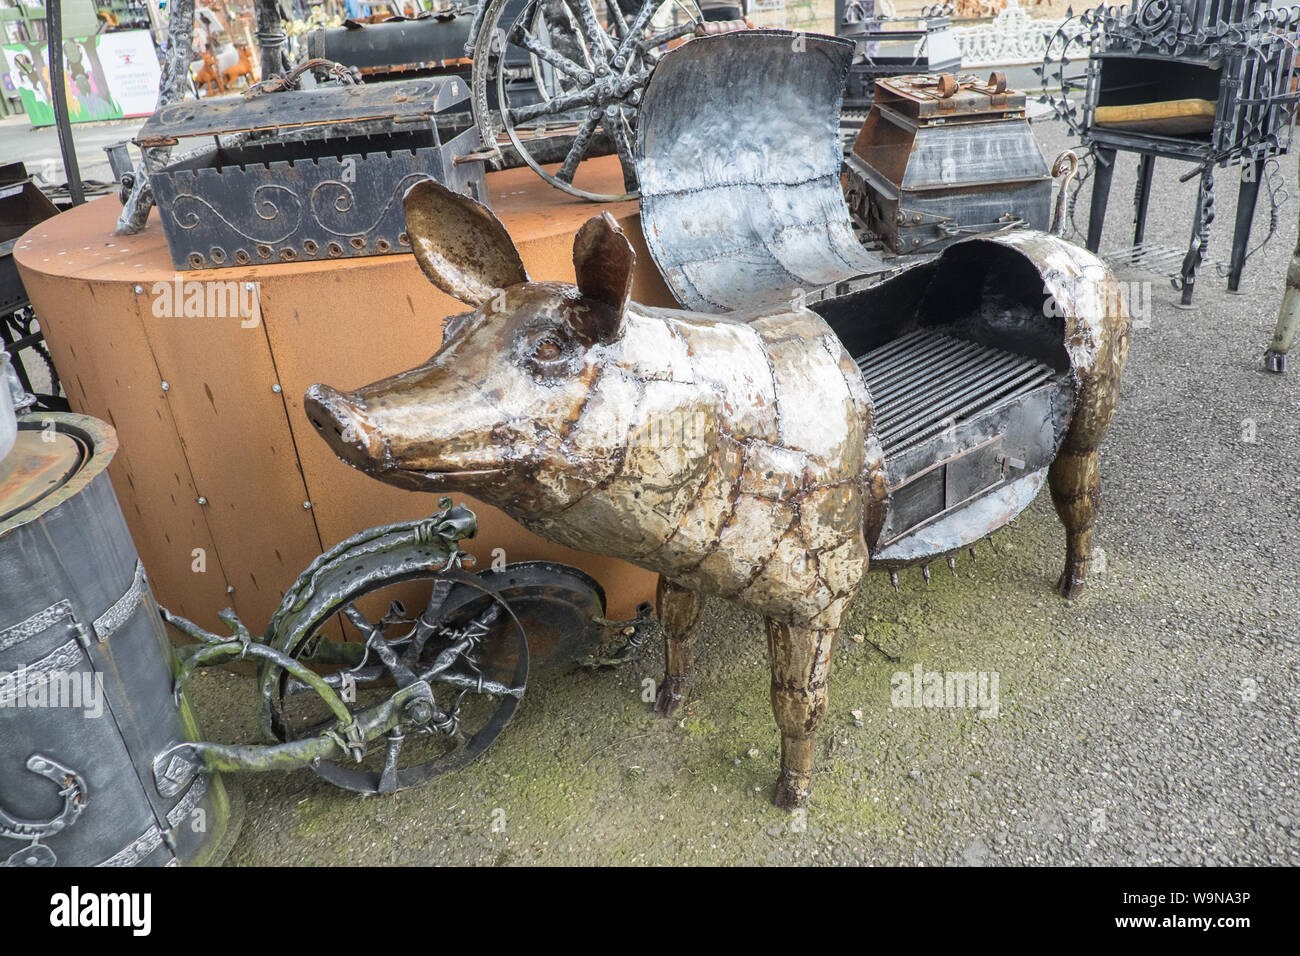 British Ironworks Centre and Shropshire Sculpture Park,off A5 road,Morda,Oswestry,Shropshire,England,Wales,Welsh,border,UK,GB,English,British, Stock Photo